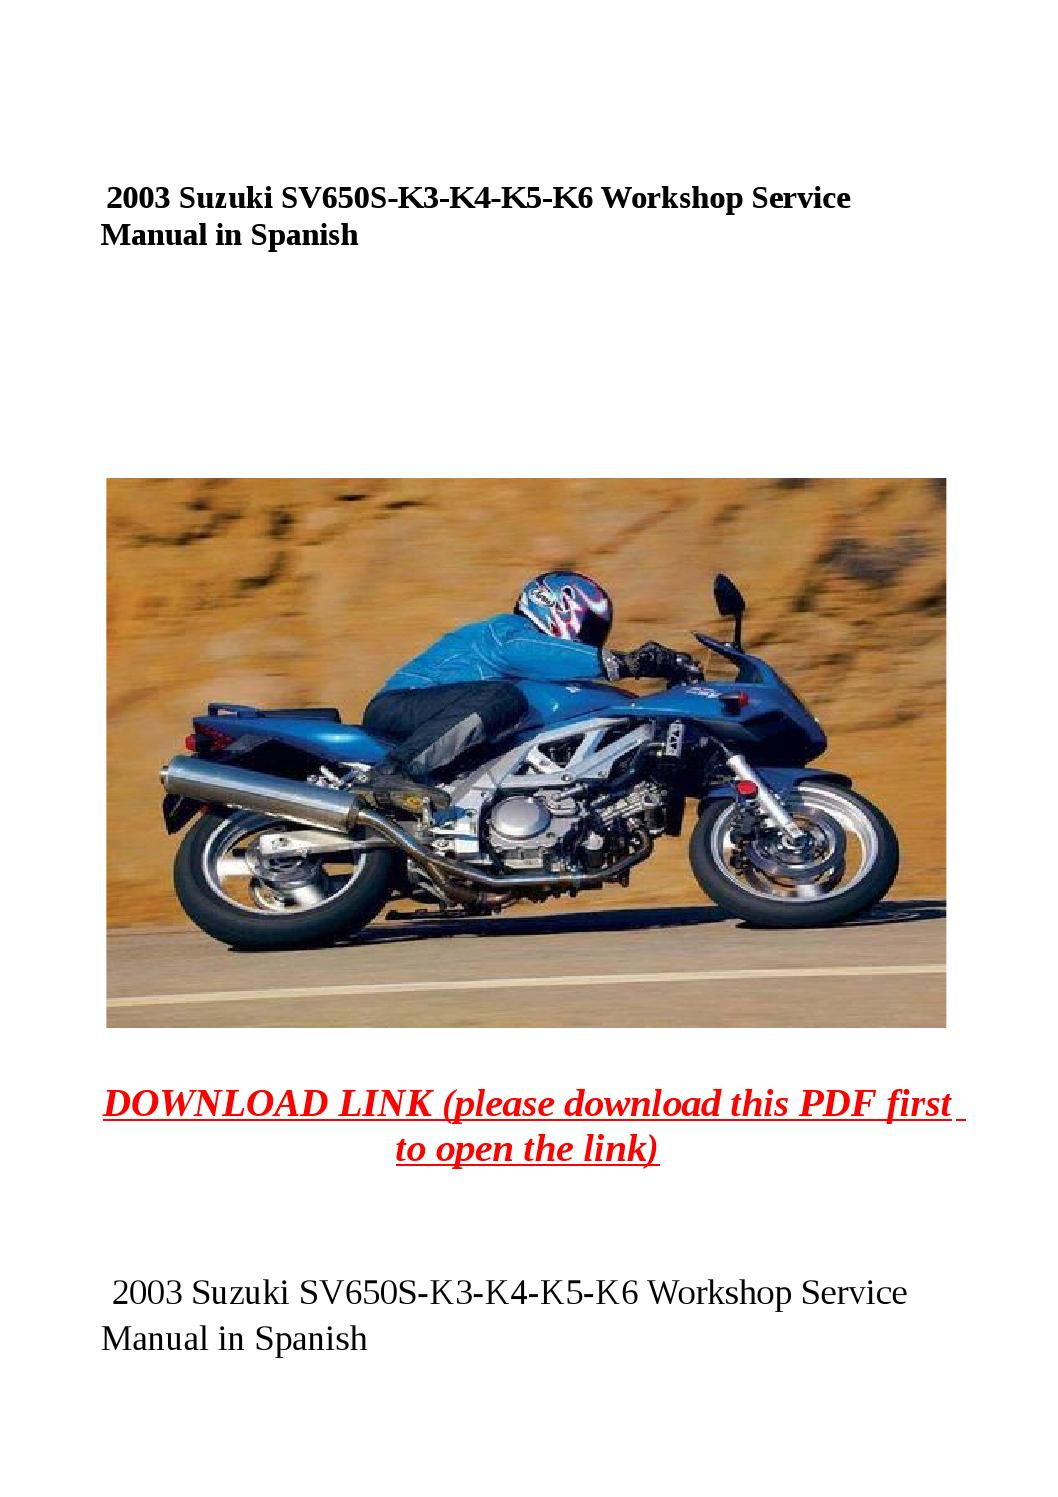 hight resolution of 2003 suzuki sv650s k3 k4 k5 k6 workshop service manual in spanish